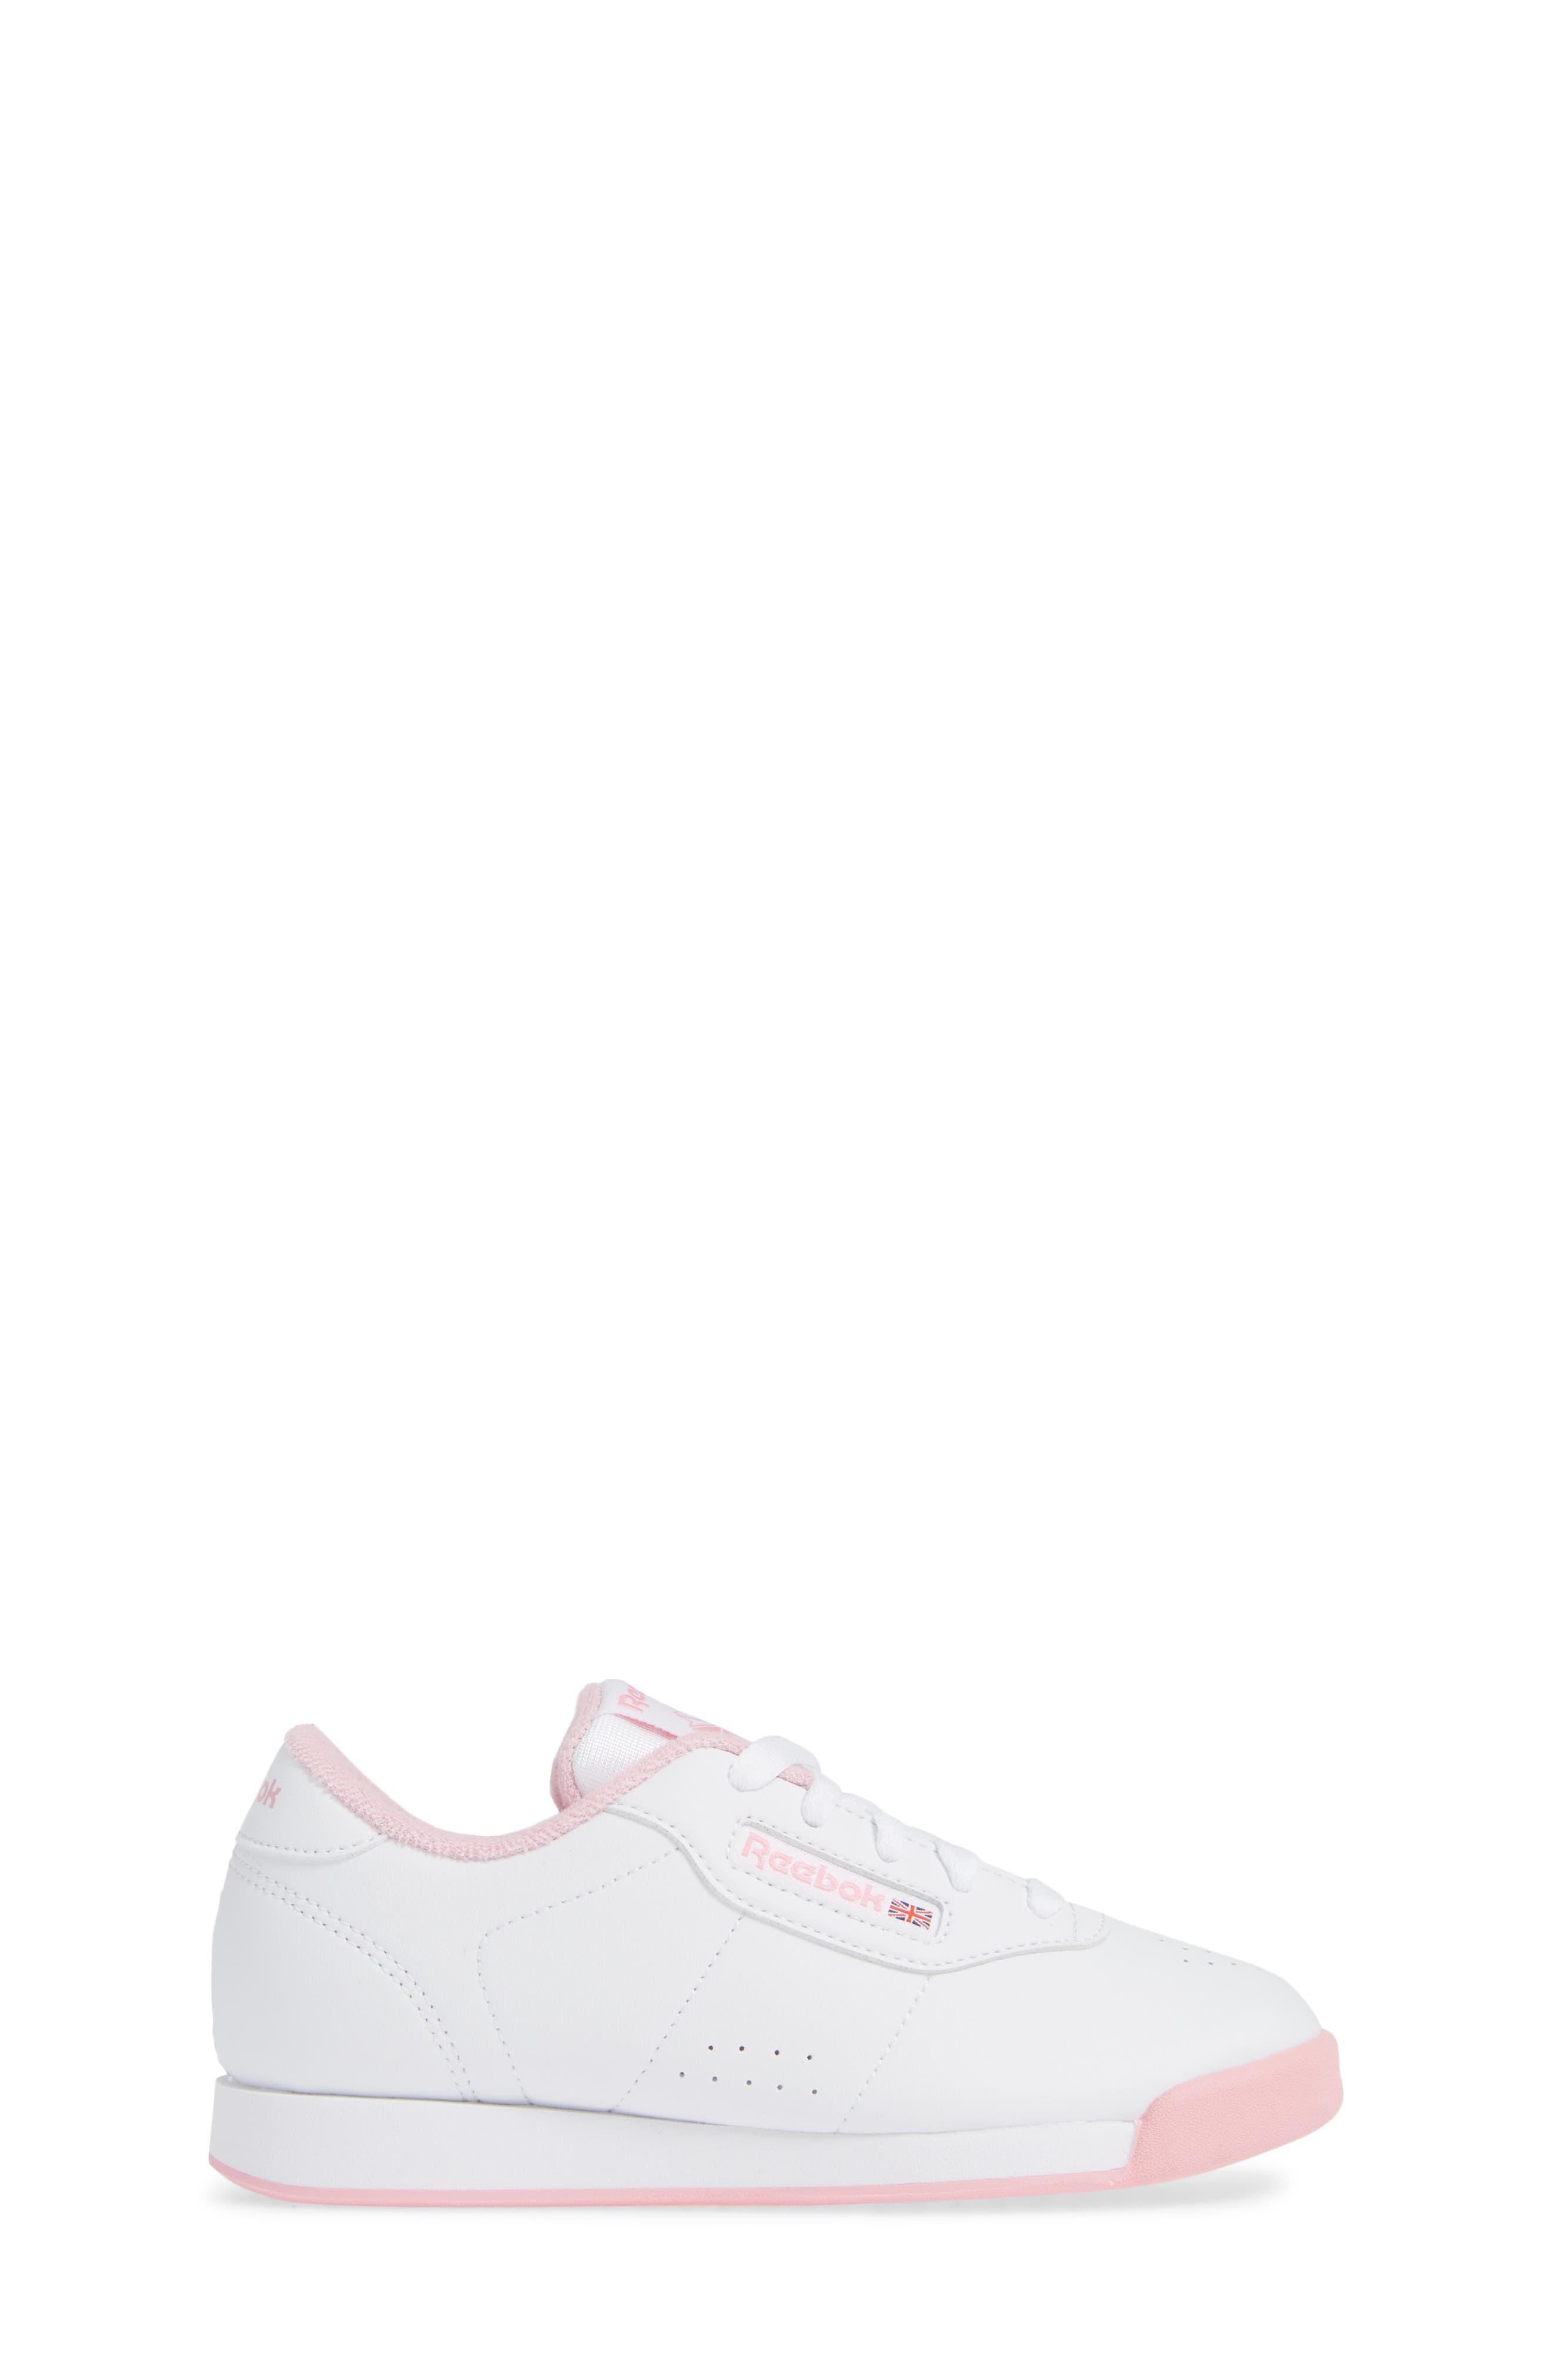 REEBOK,                             Princess Sneaker,                             Alternate thumbnail 3, color,                             100